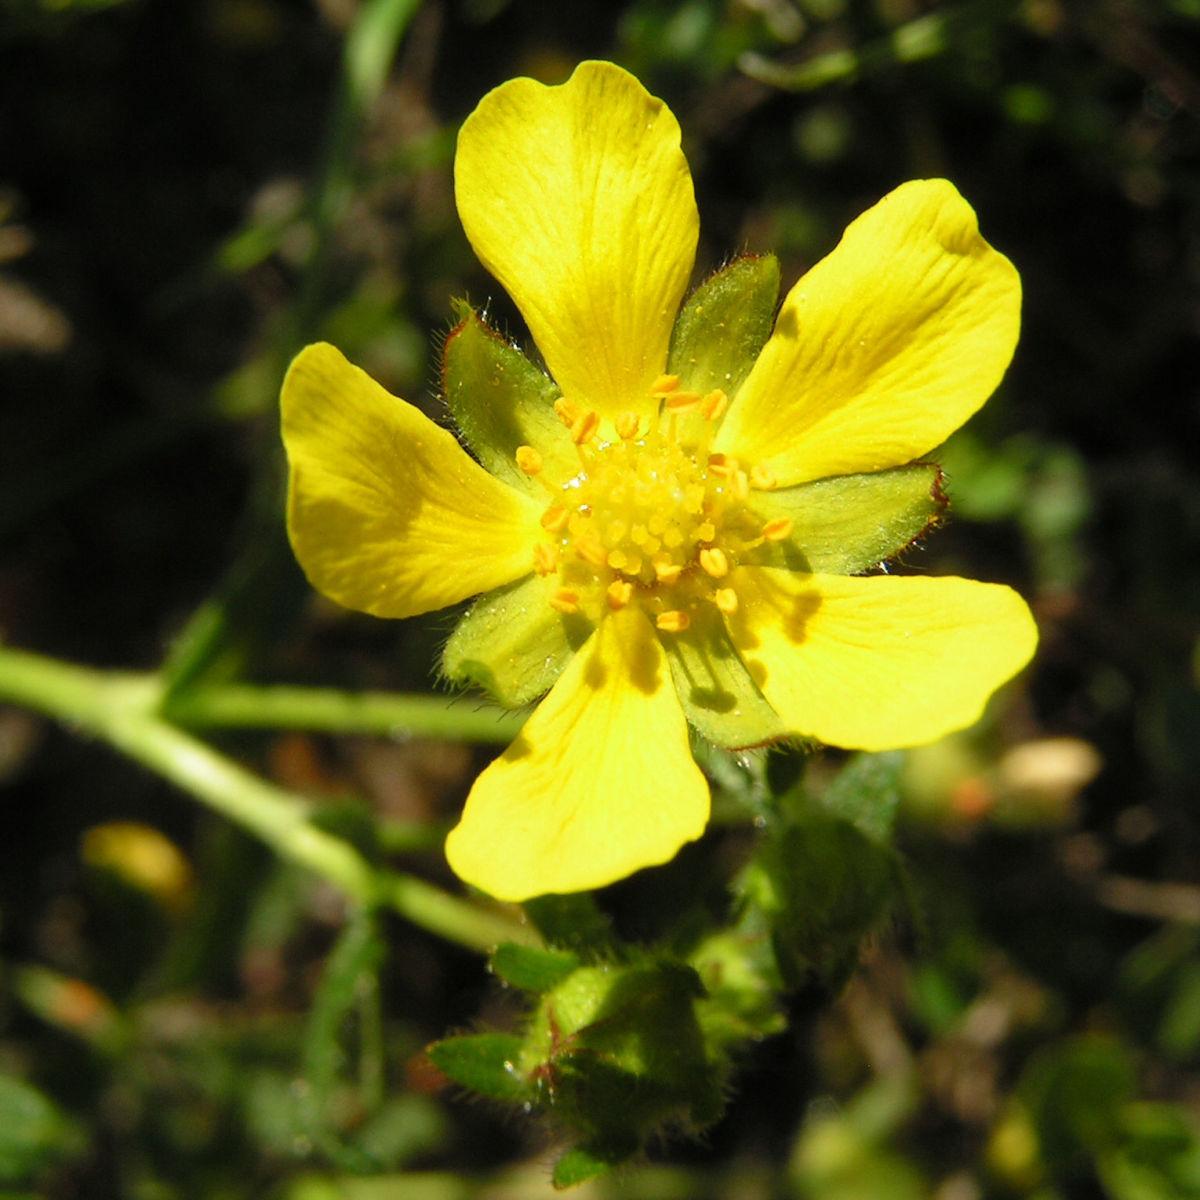 Fruehlings Fingerkraut Bluete gelb Potentilla tabernaemontani